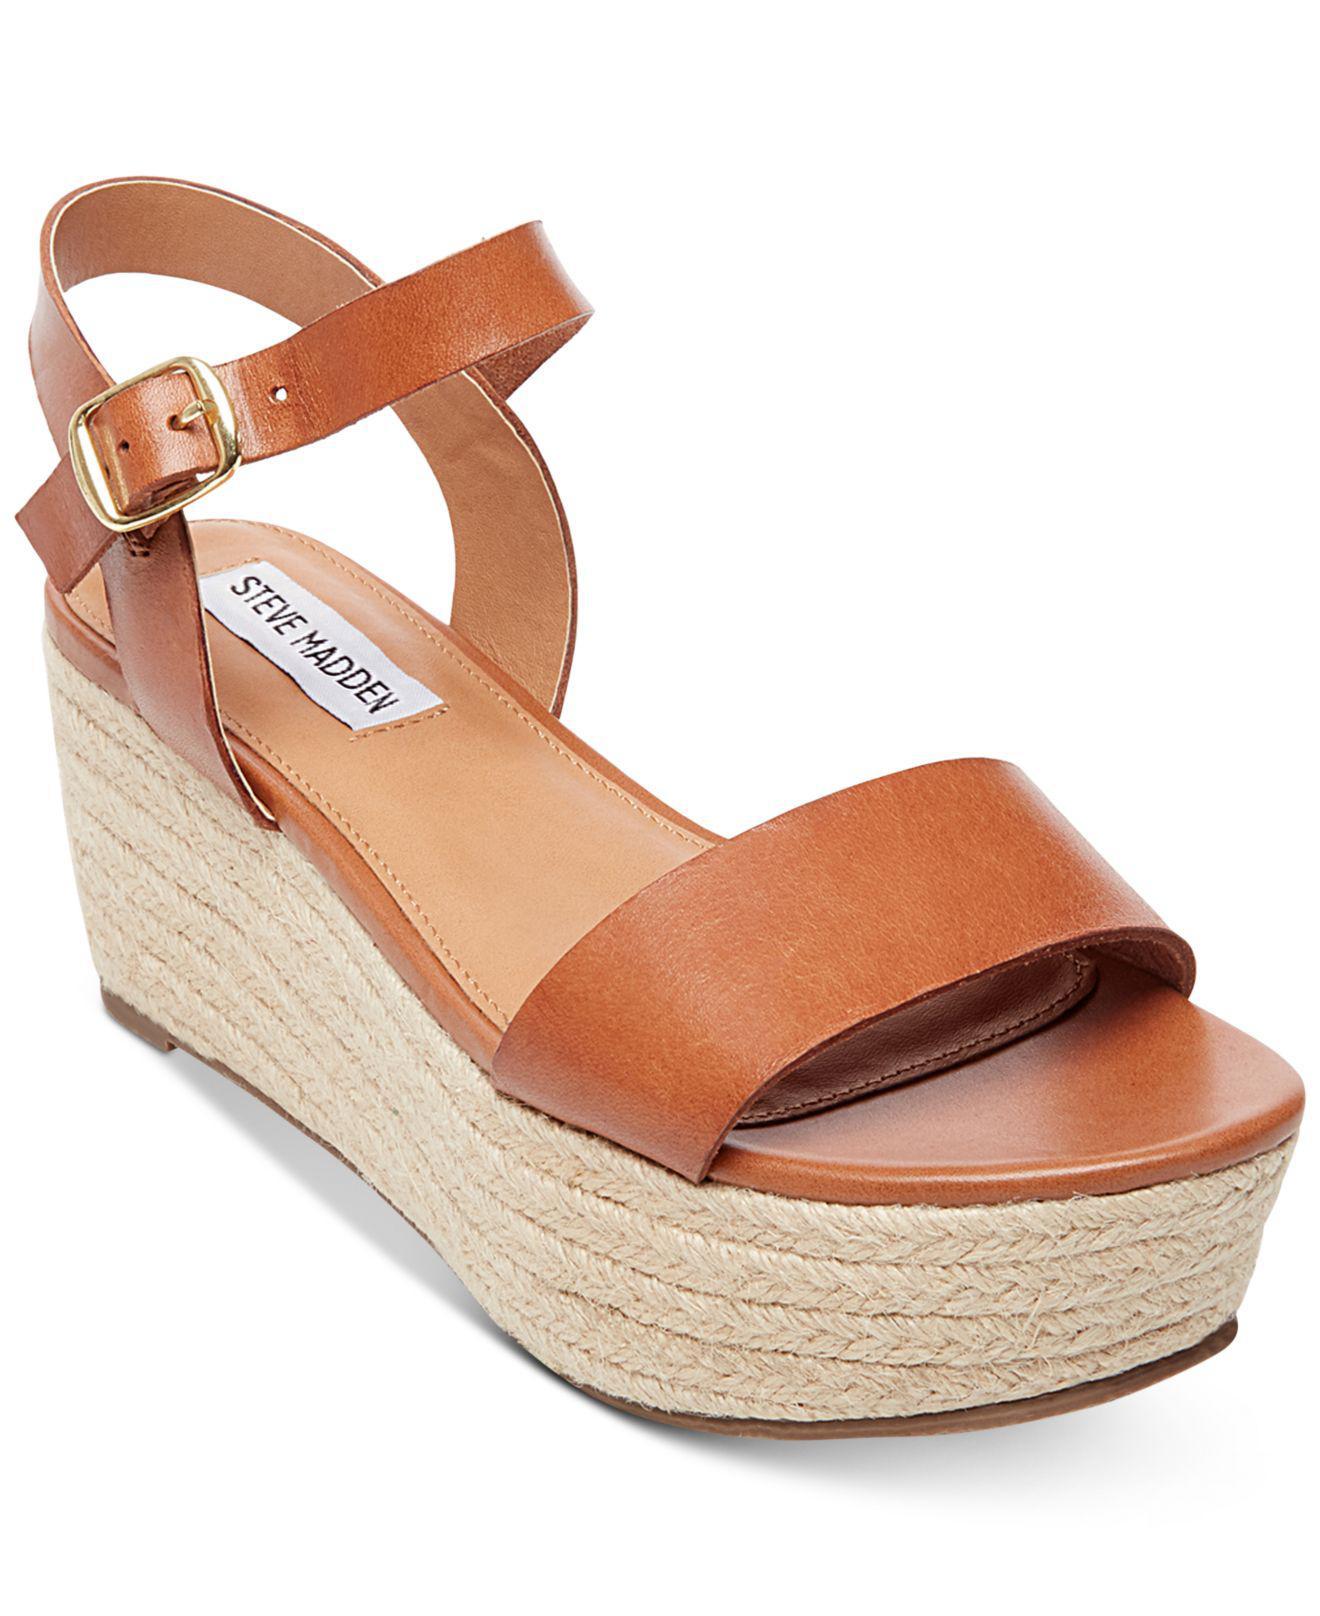 5f5da3bd0425 Lyst - Steve Madden Busy Espadrille Wedge Sandals in Brown